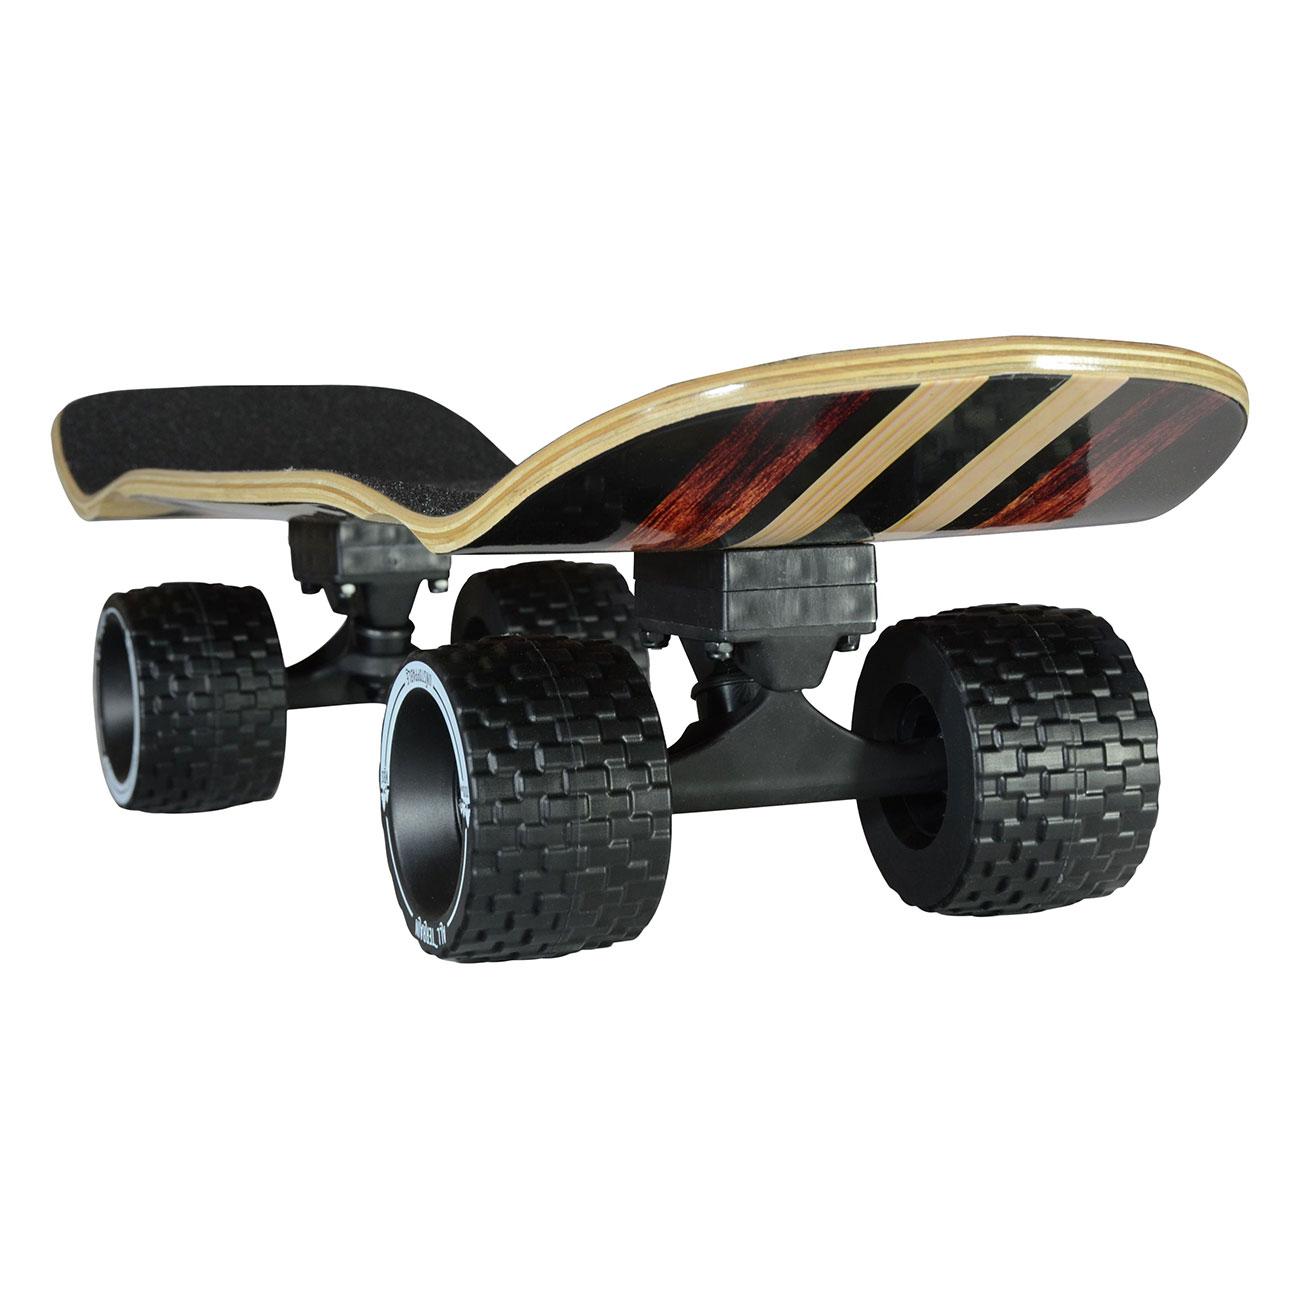 Skateboard Uses: MBS All Terrain Skateboard